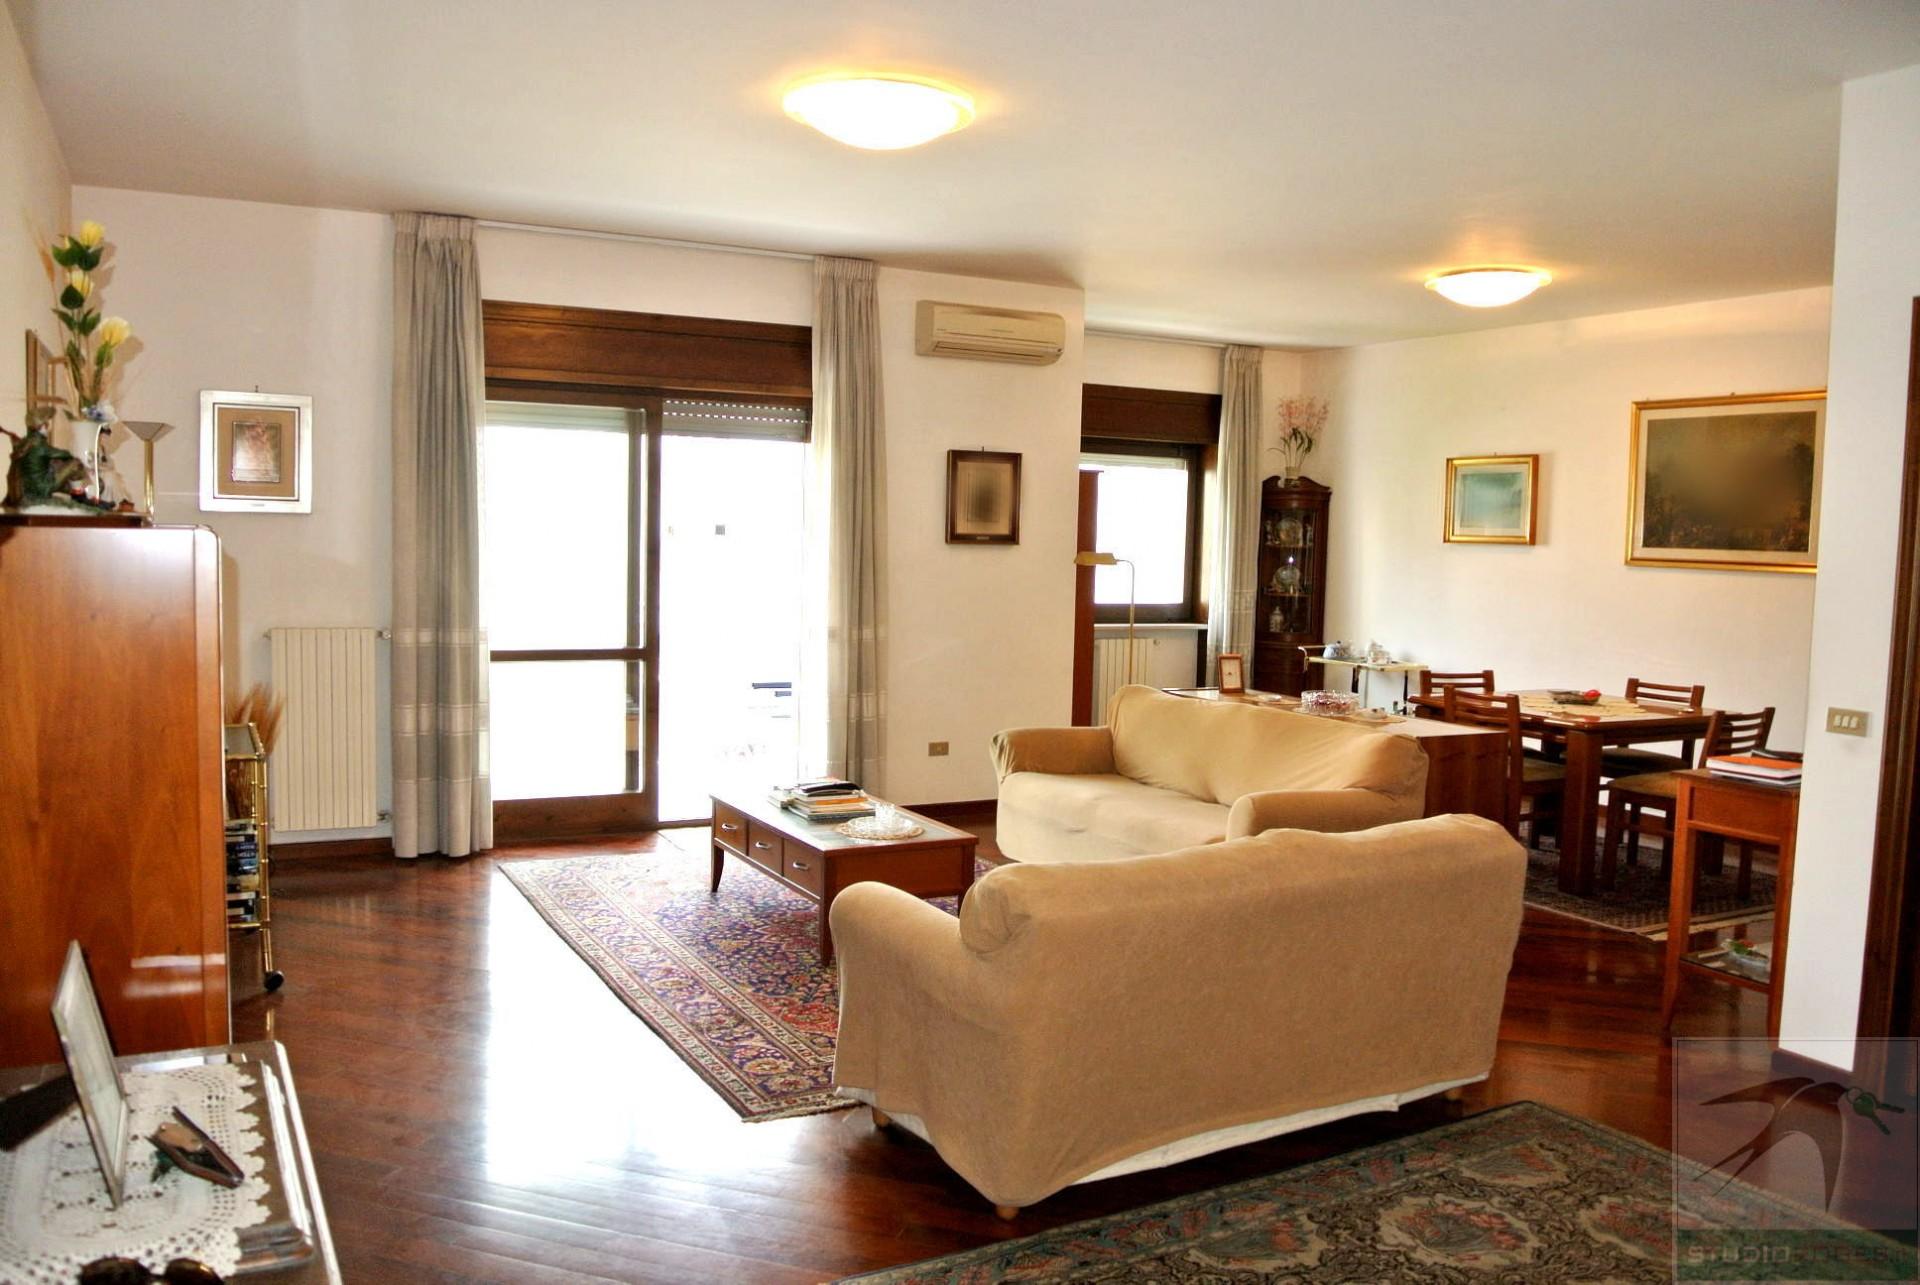 Appartamento in Vendita 186,00 mq - N. camere: 5 - - Rende - Roges-Commenda (CS)